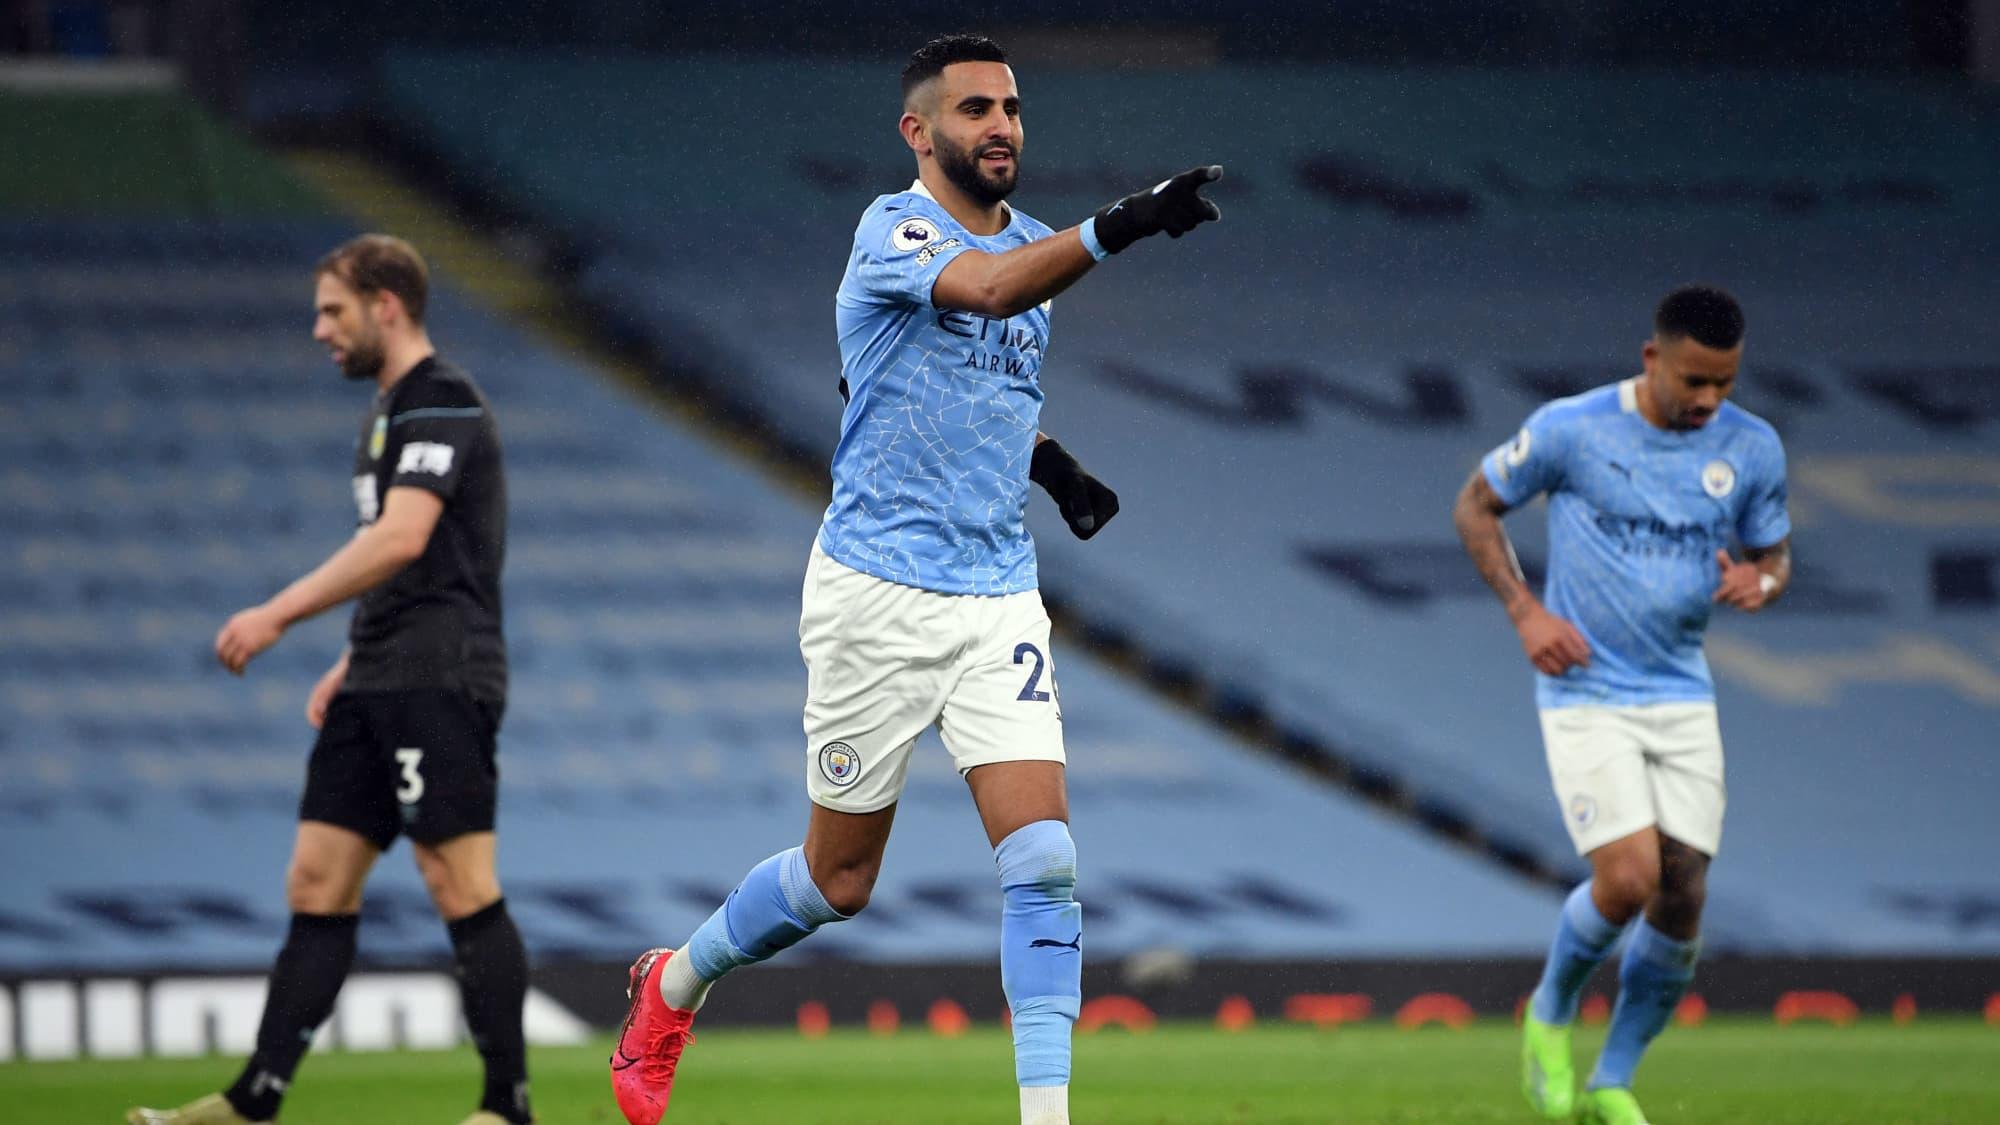 Manchester City-Dortmund, the lines: Mahrez preferred to Sterling